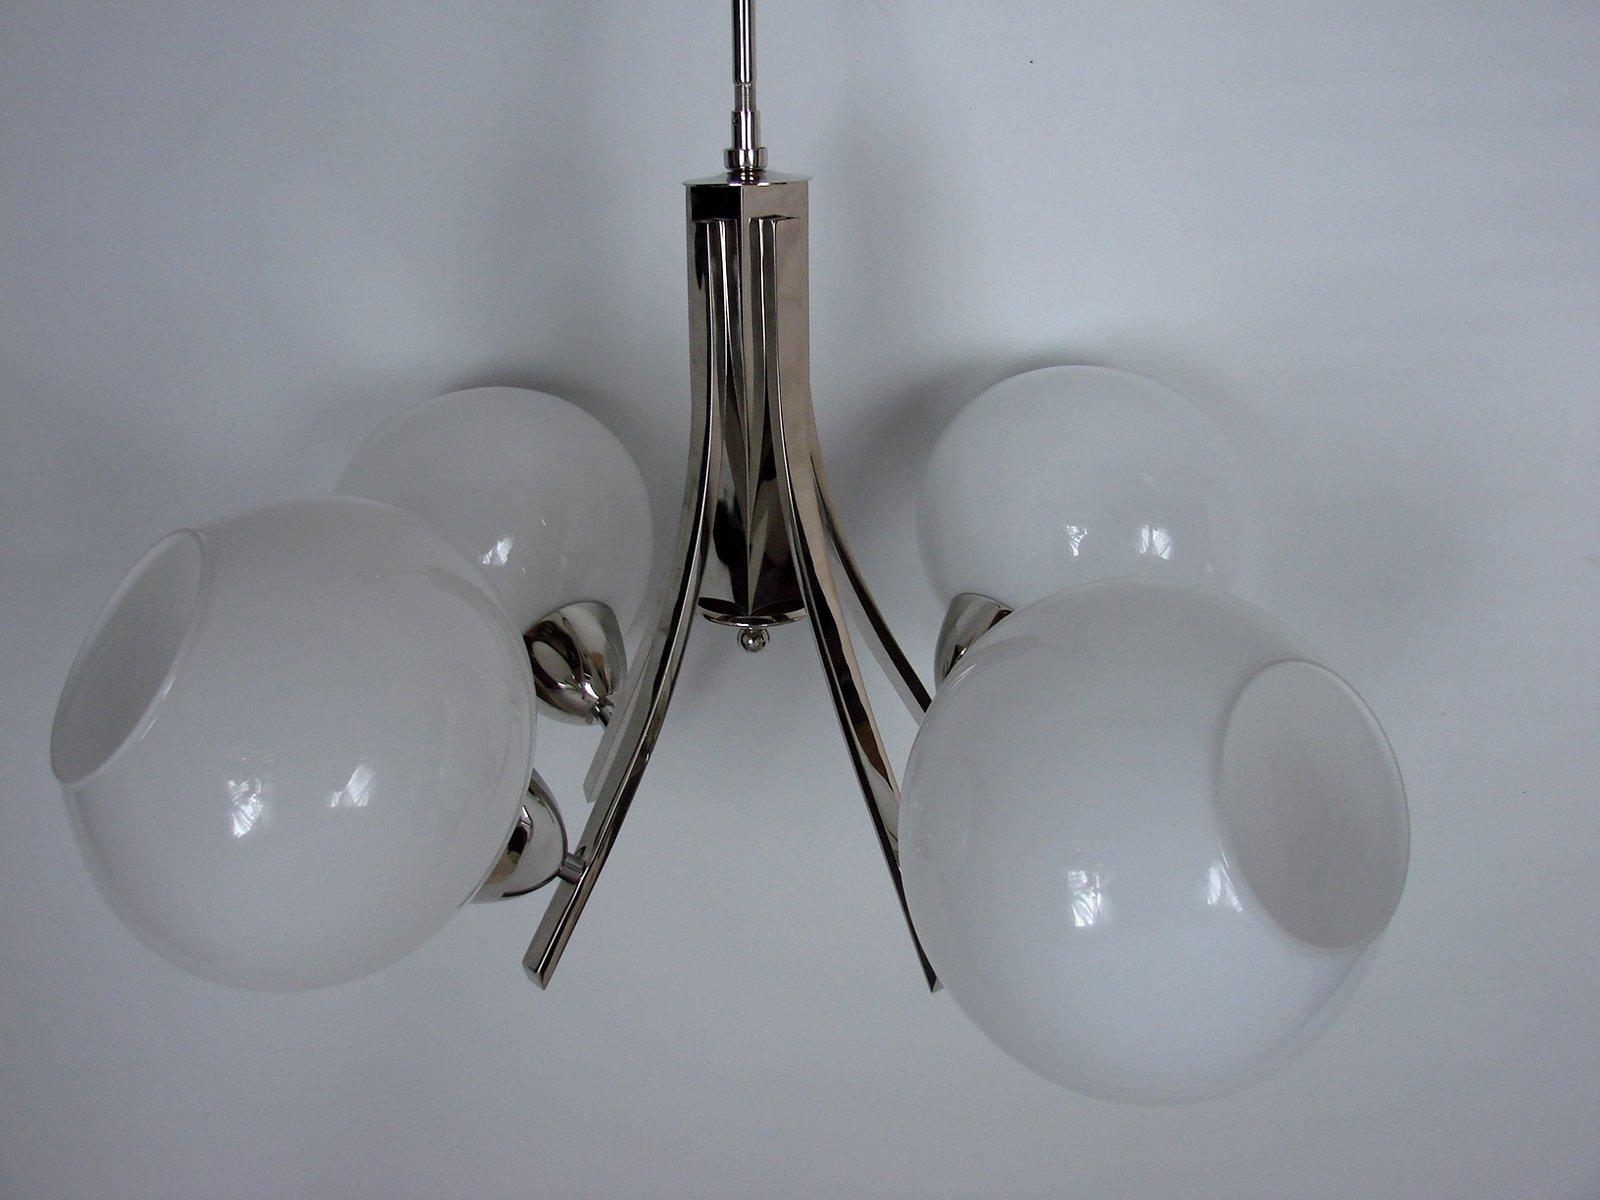 Kronleuchter Vintage Silber ~ Vintage kristallglas kronleuchter von bakalowits söhne er